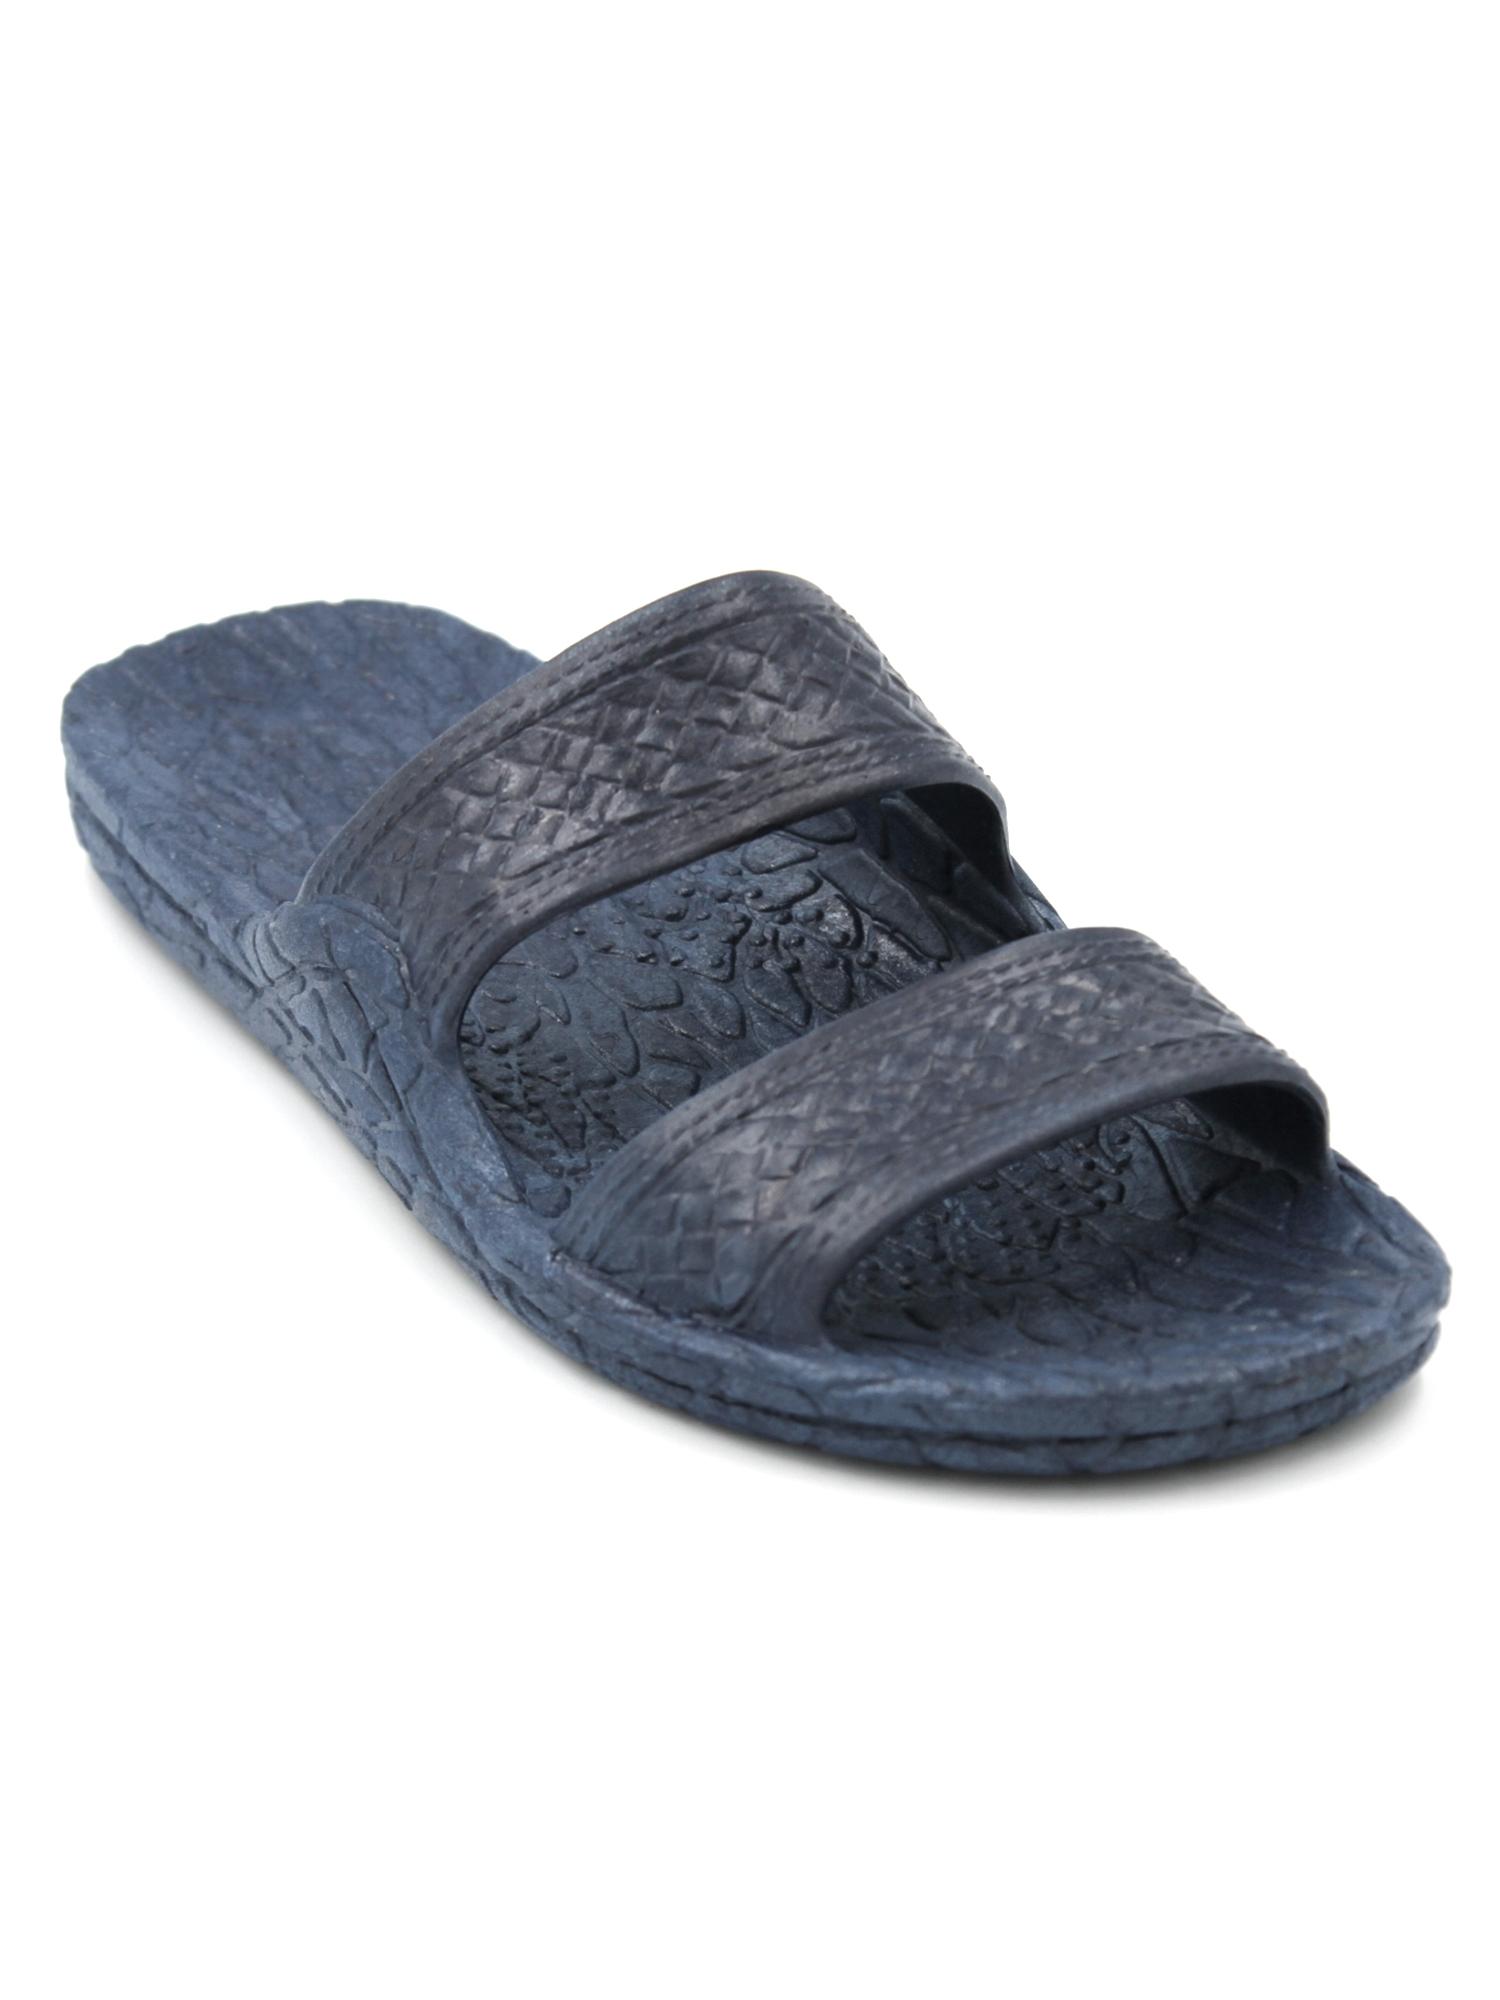 Pali Hawaii Genuine Original Jesus Jandal Sandal (Navy Blue;Size 5)